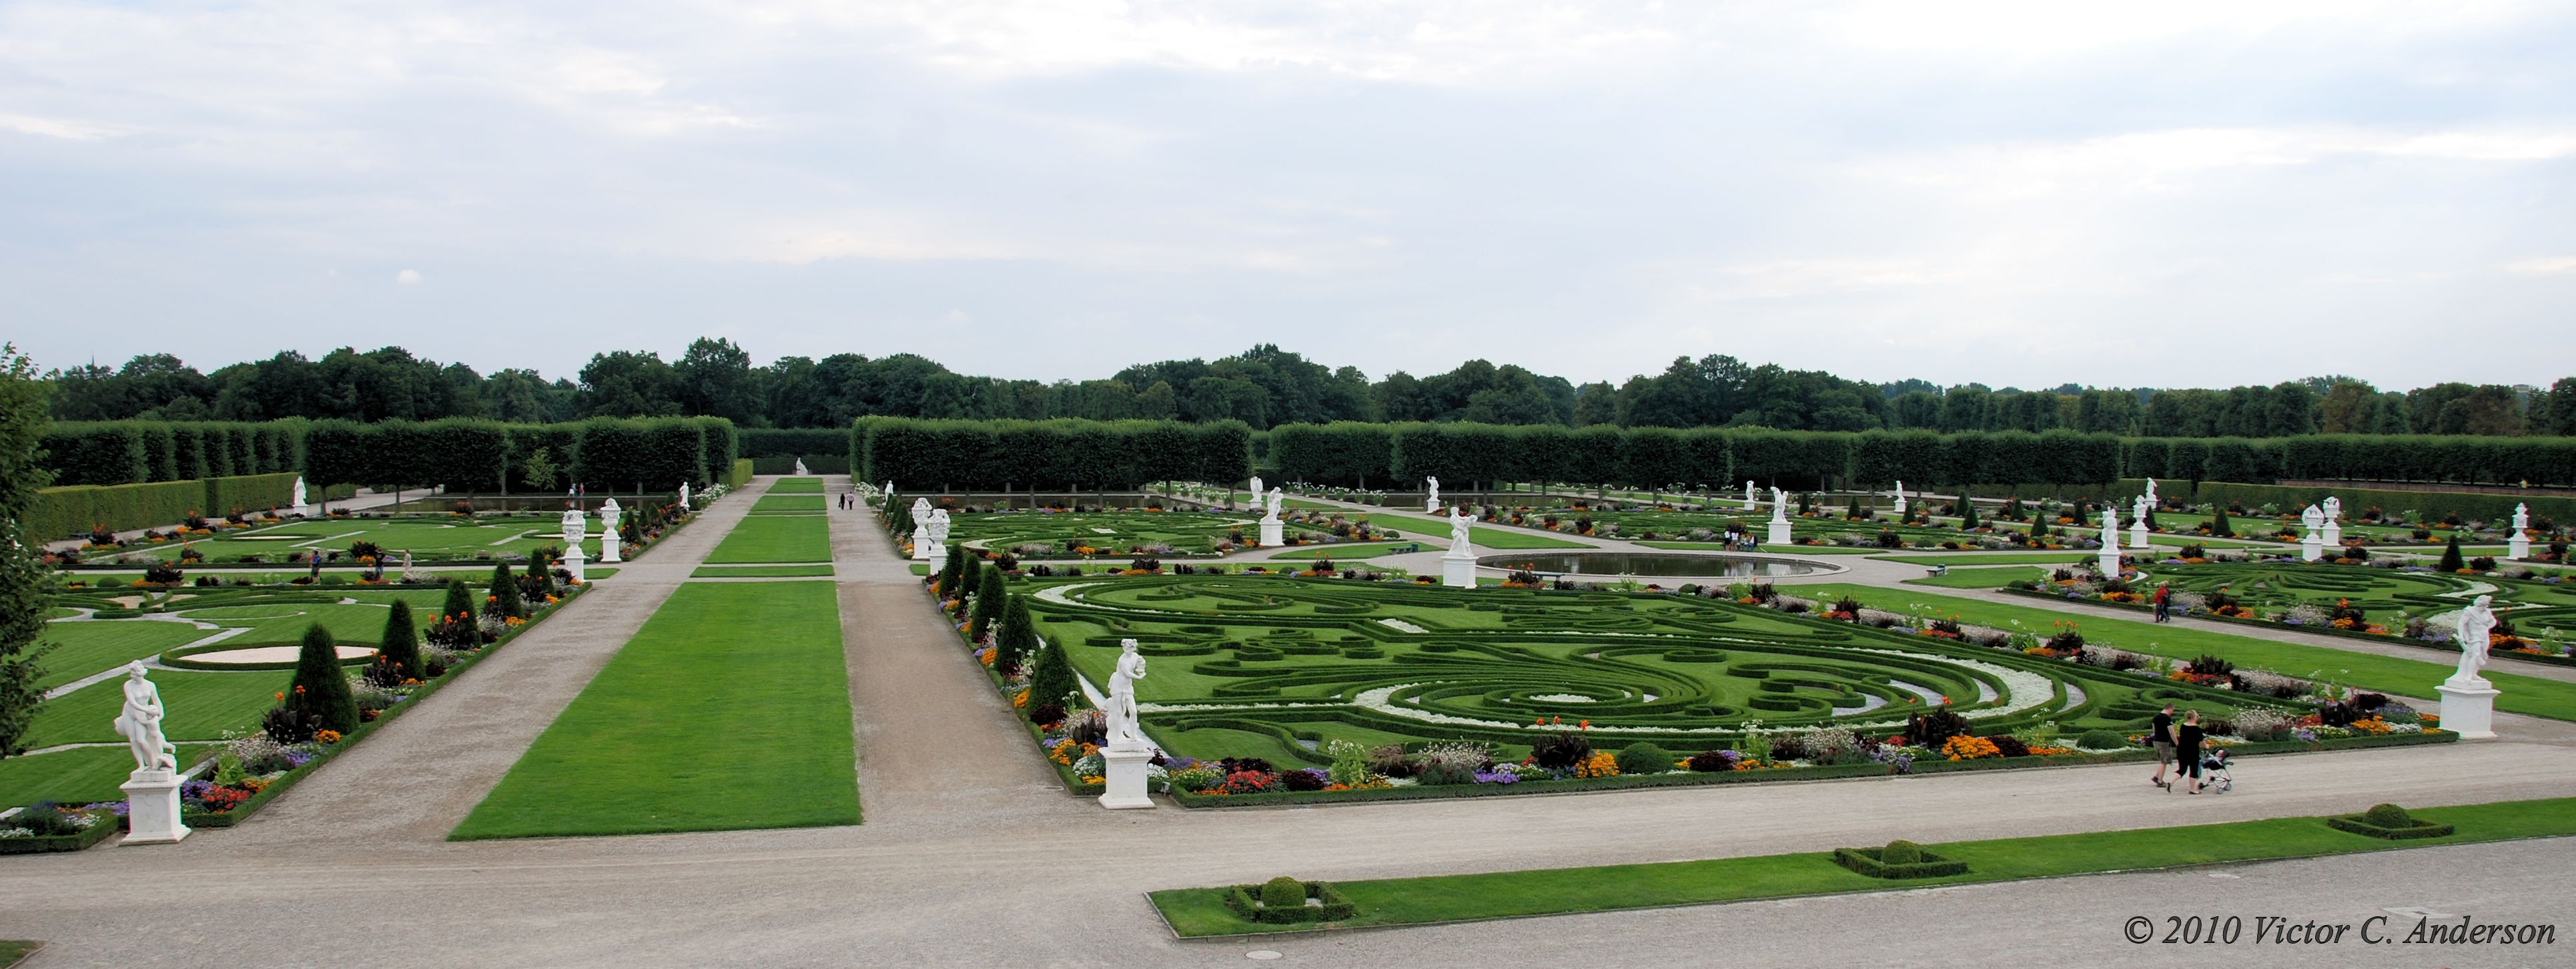 Herrenhausen Gardens 2010